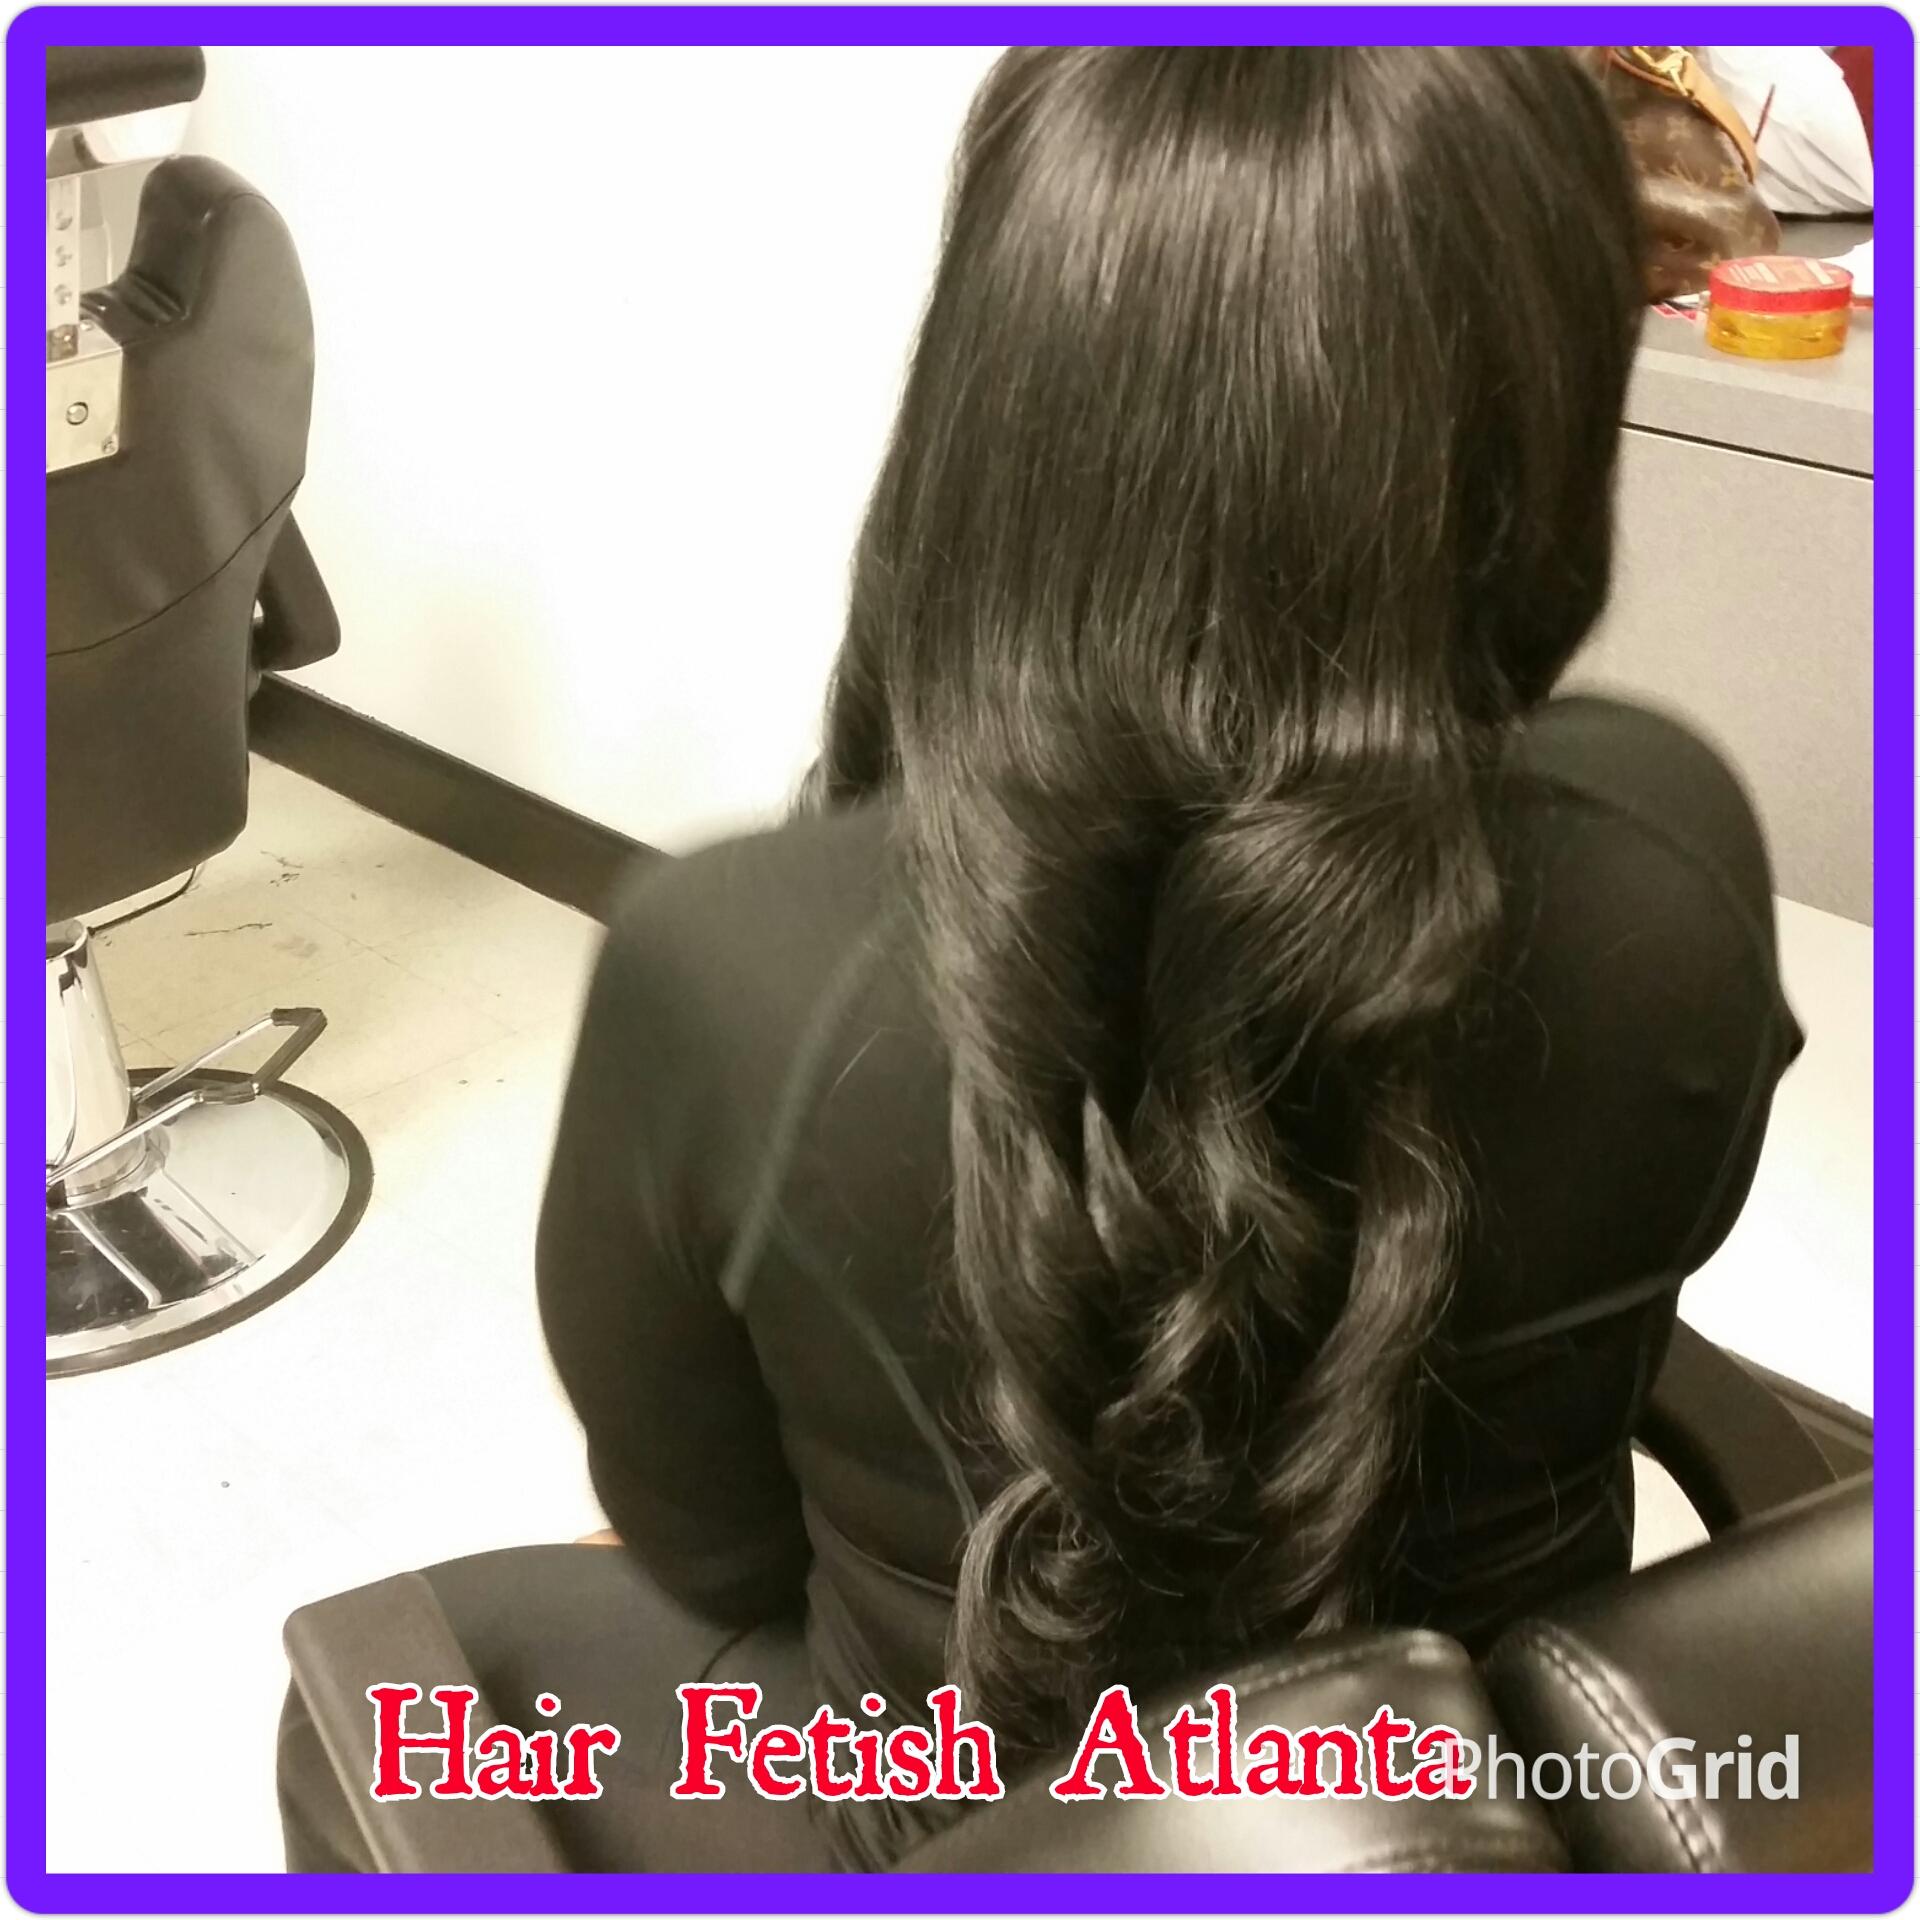 hair fetishism